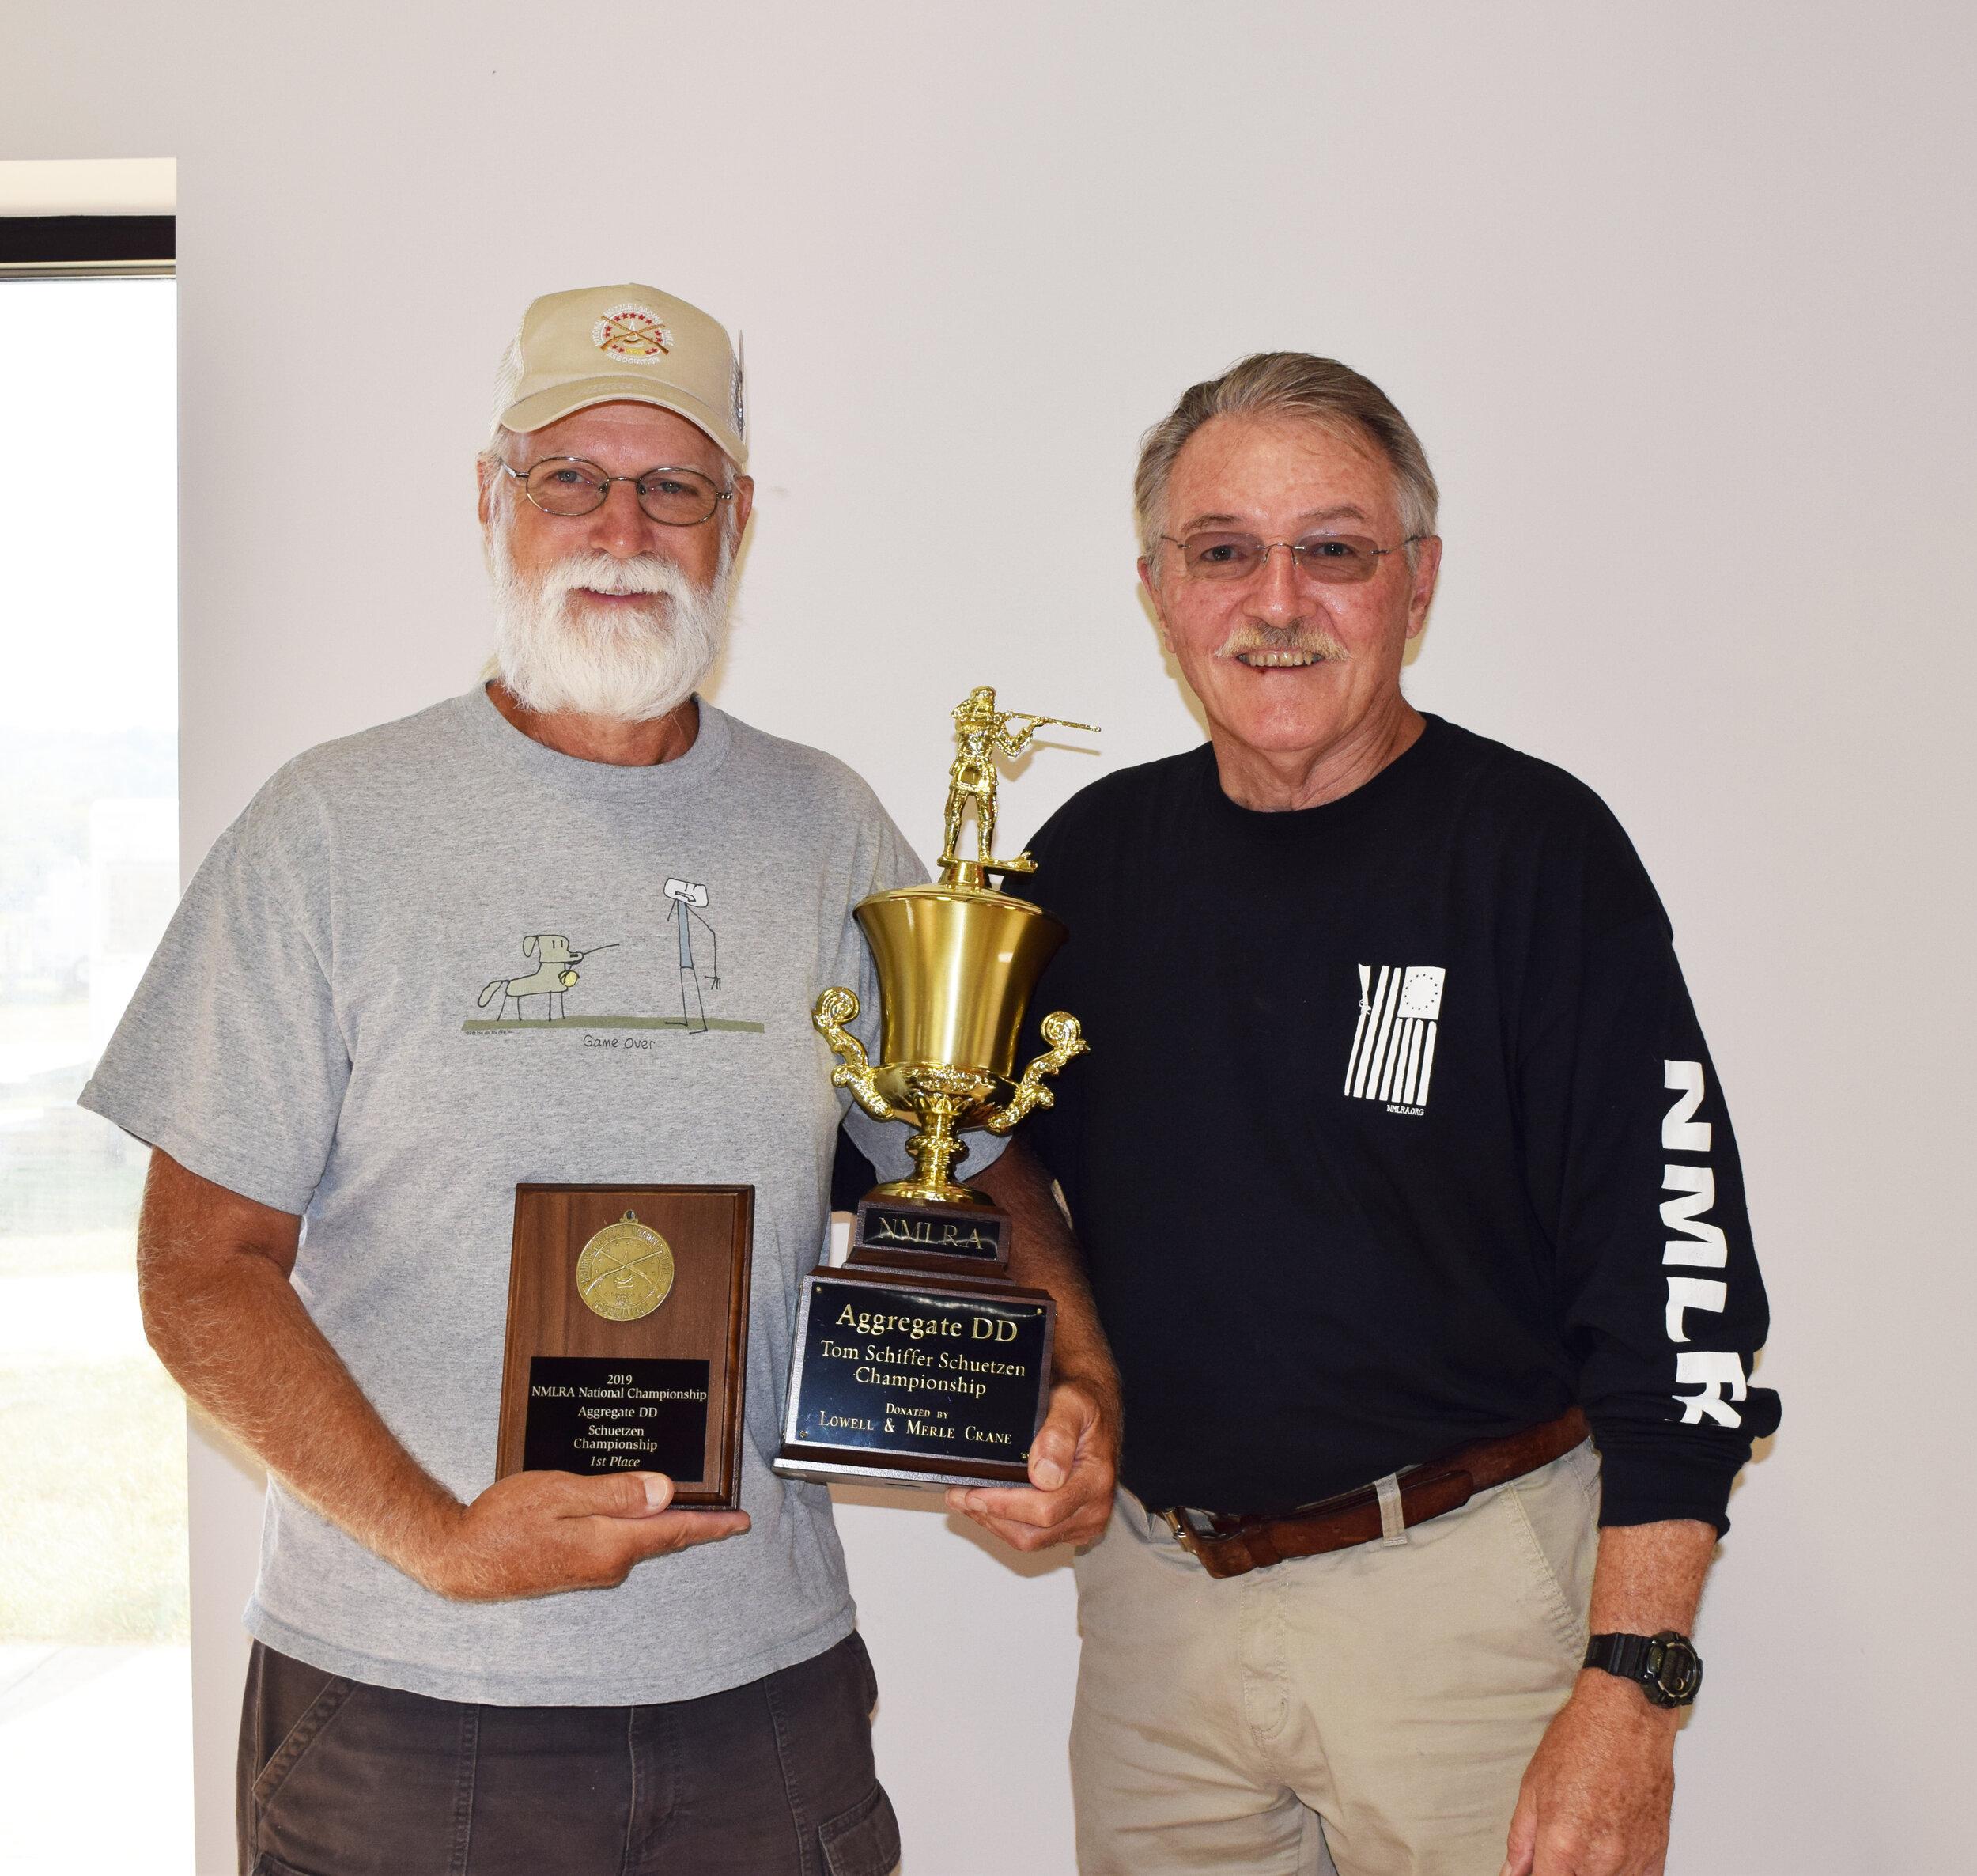 Lowell Crane - Aggregate DD - Tom Schiffer Schuetzen Championship Winner with NMLRA President Brent Steele